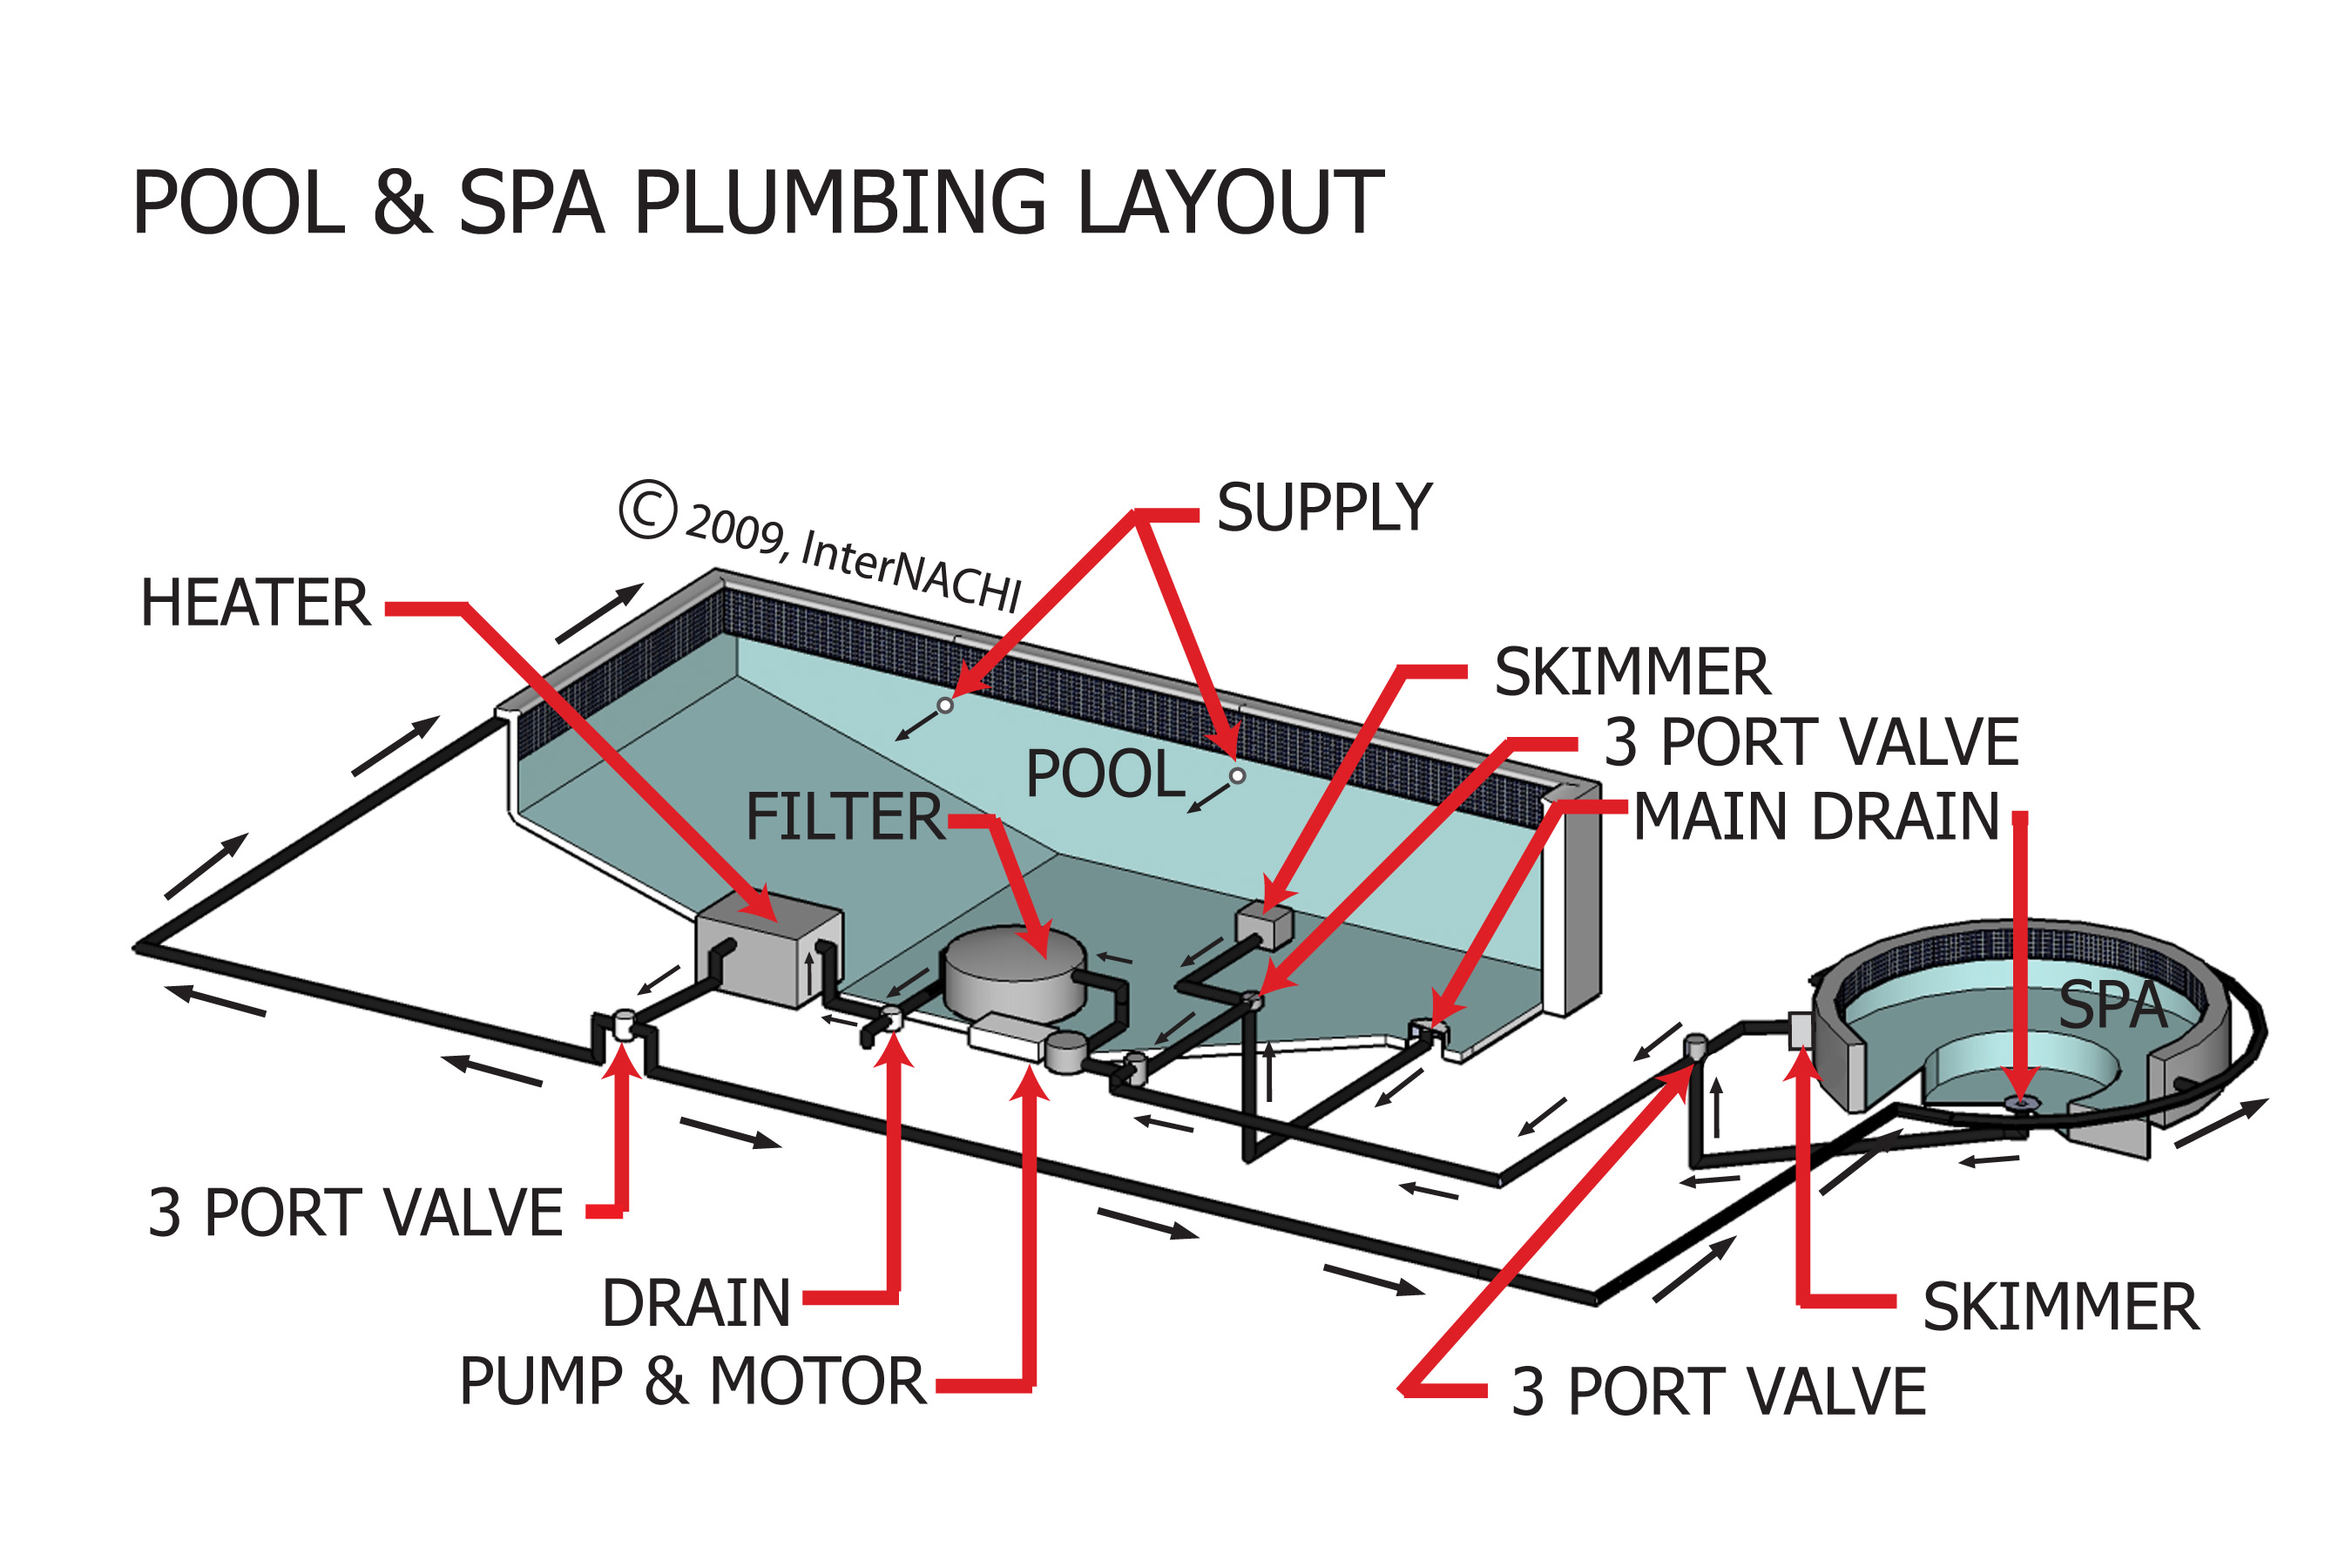 Pool & spa plumbing layout.